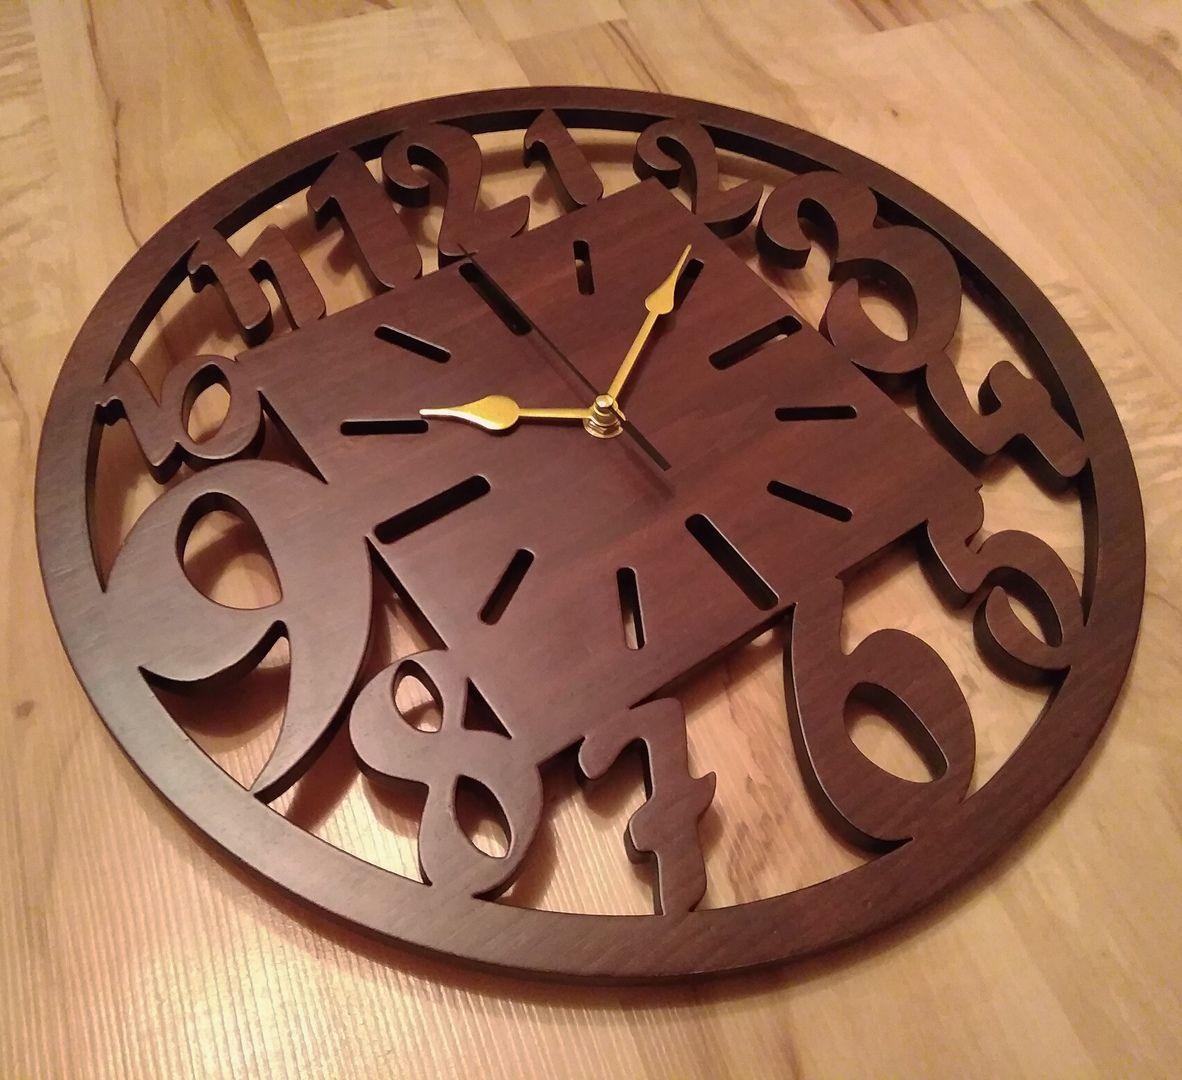 Wooden clock vector free download Деревянные часы